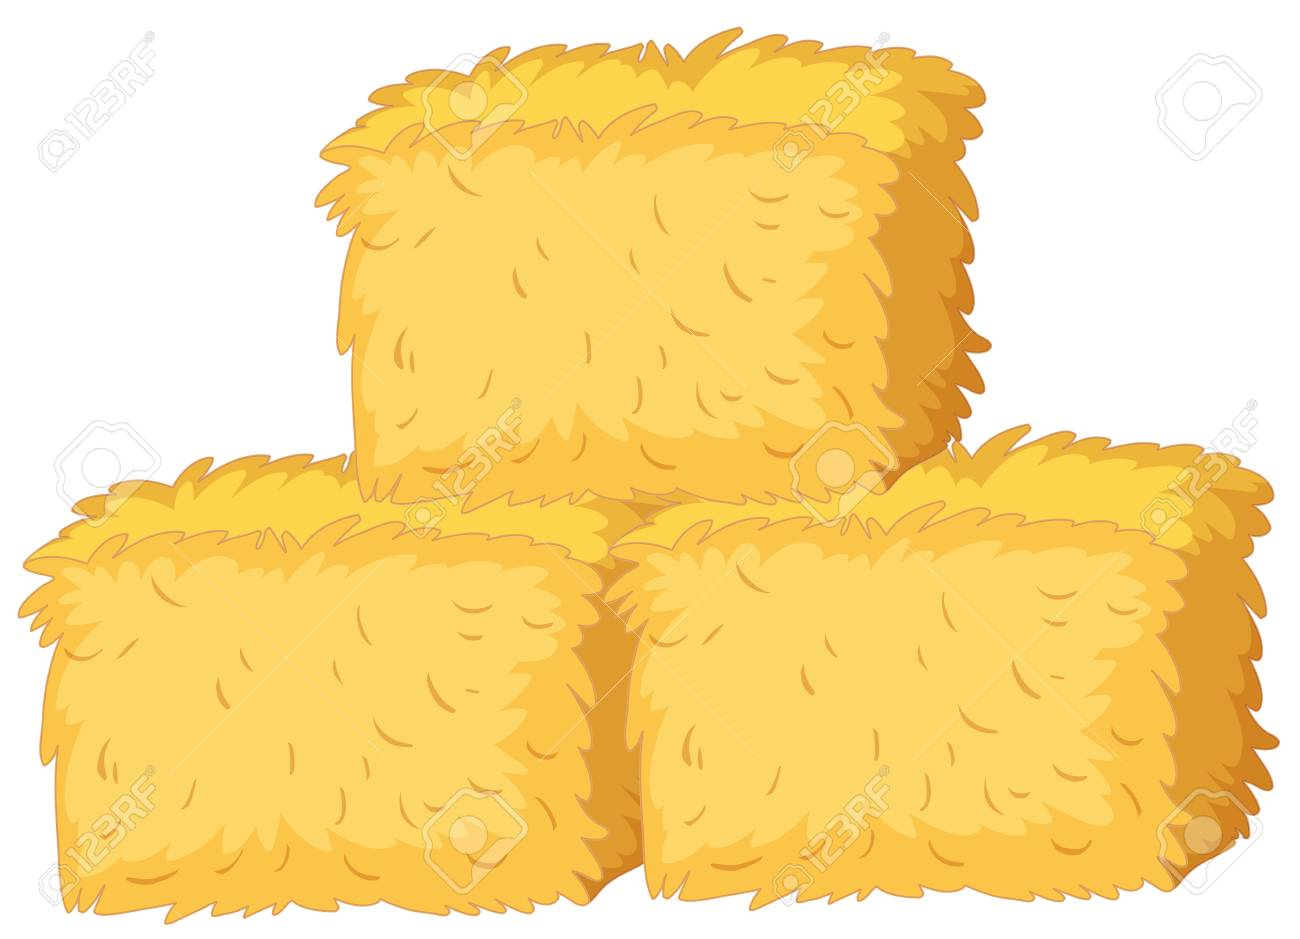 Bales of straw on white background illustration - 125822725